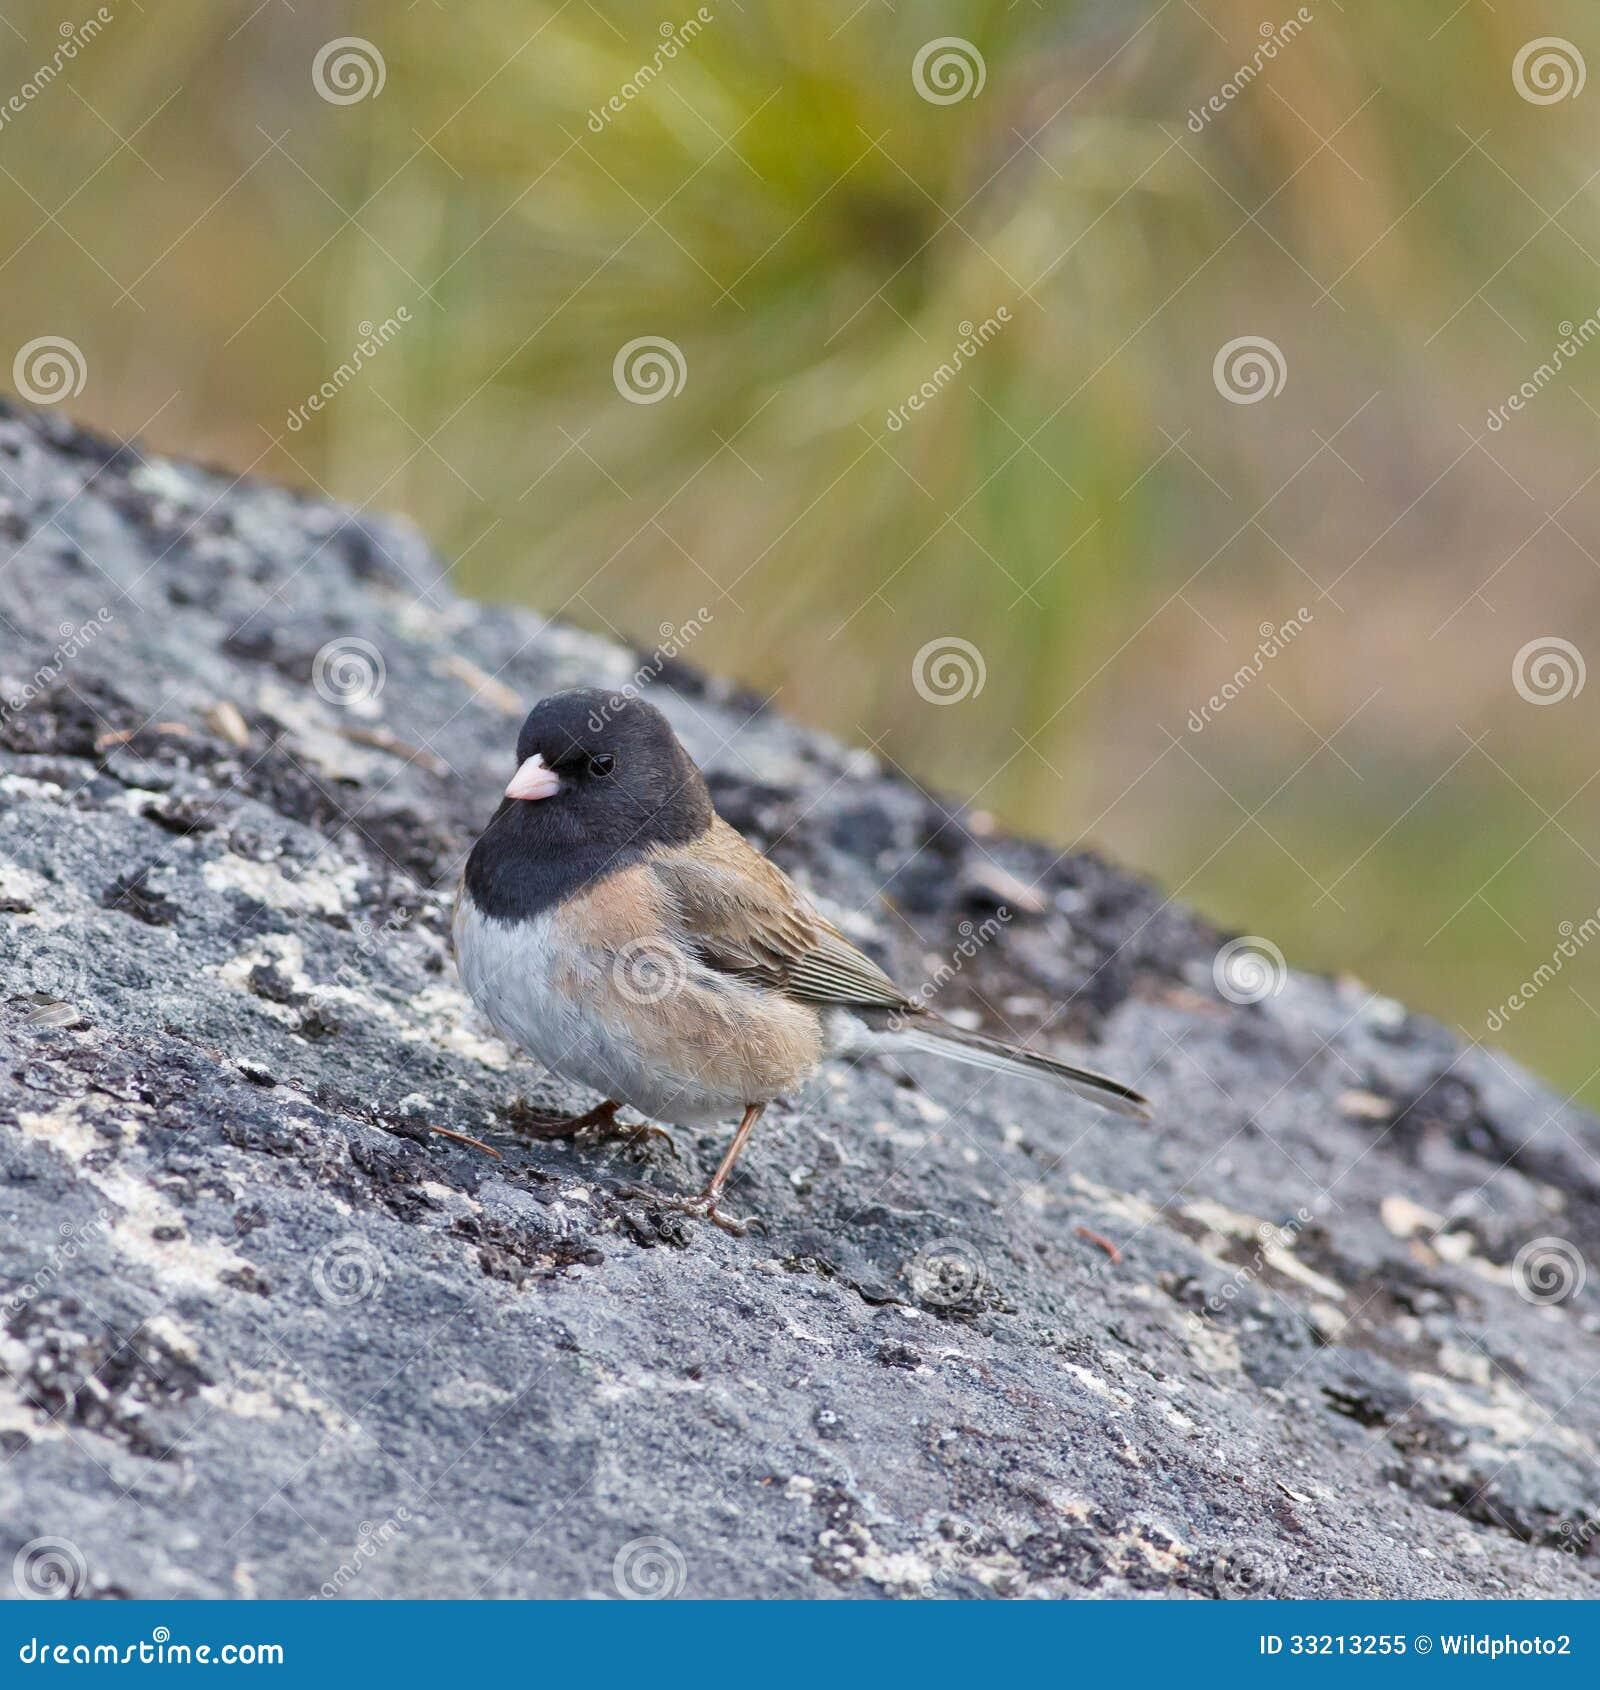 Dark-eyed Junco on a rock